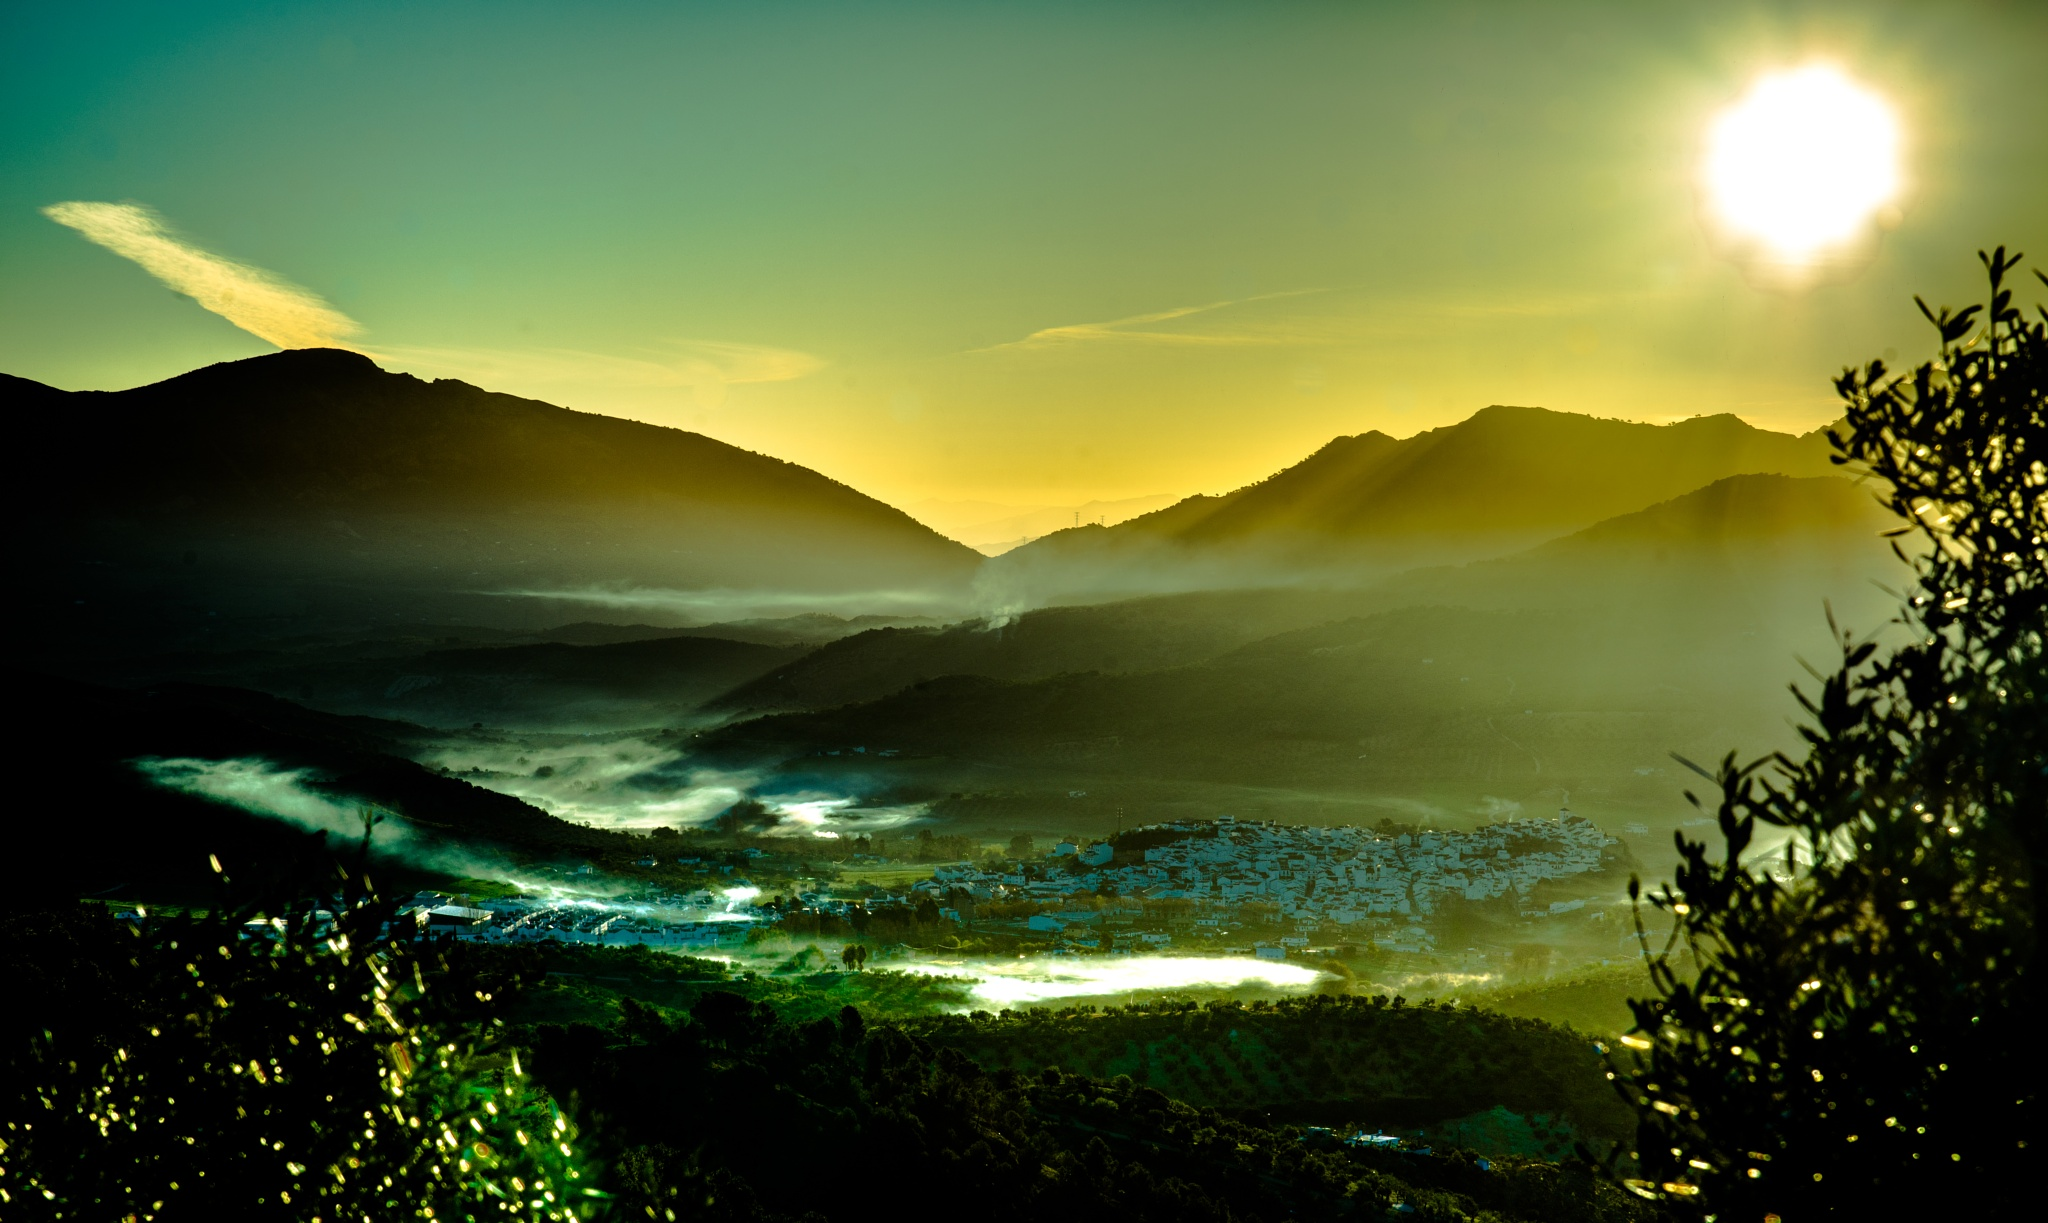 Morning Mist by Jim Buckley